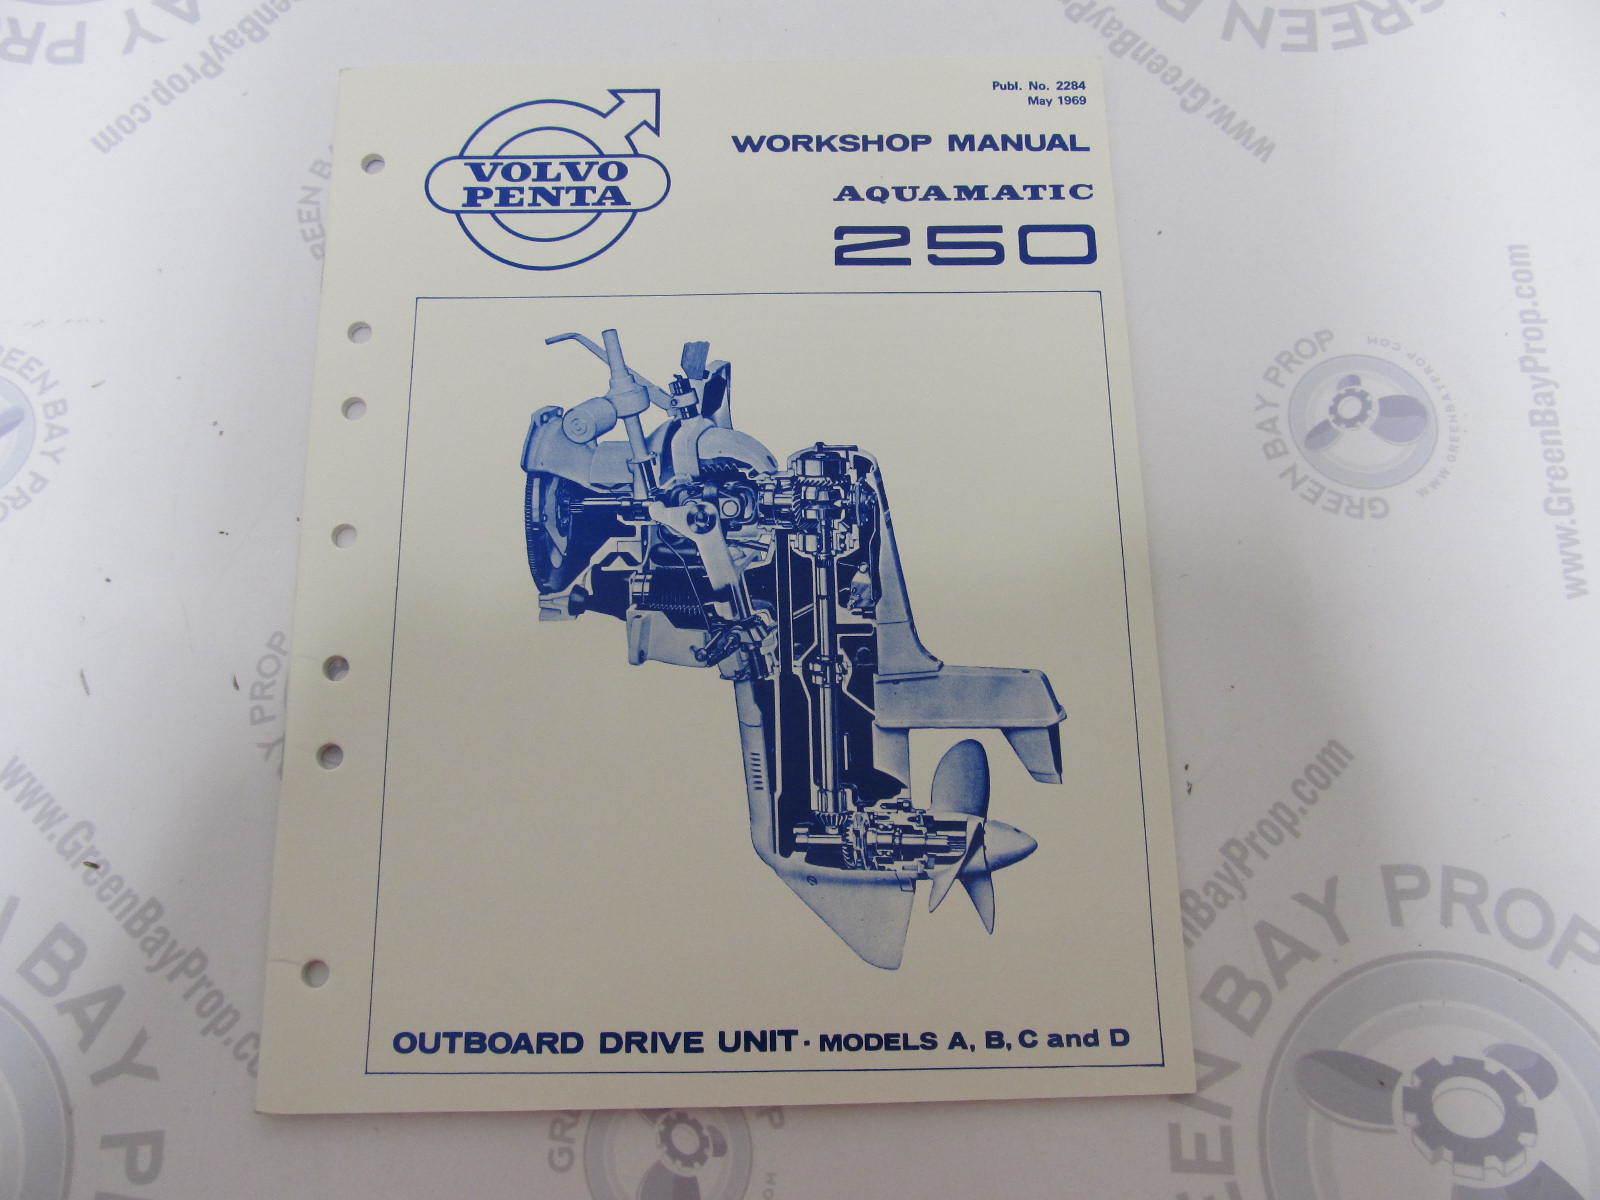 Volvo penta Aq120 Service Manual Nissan Gtr For sale